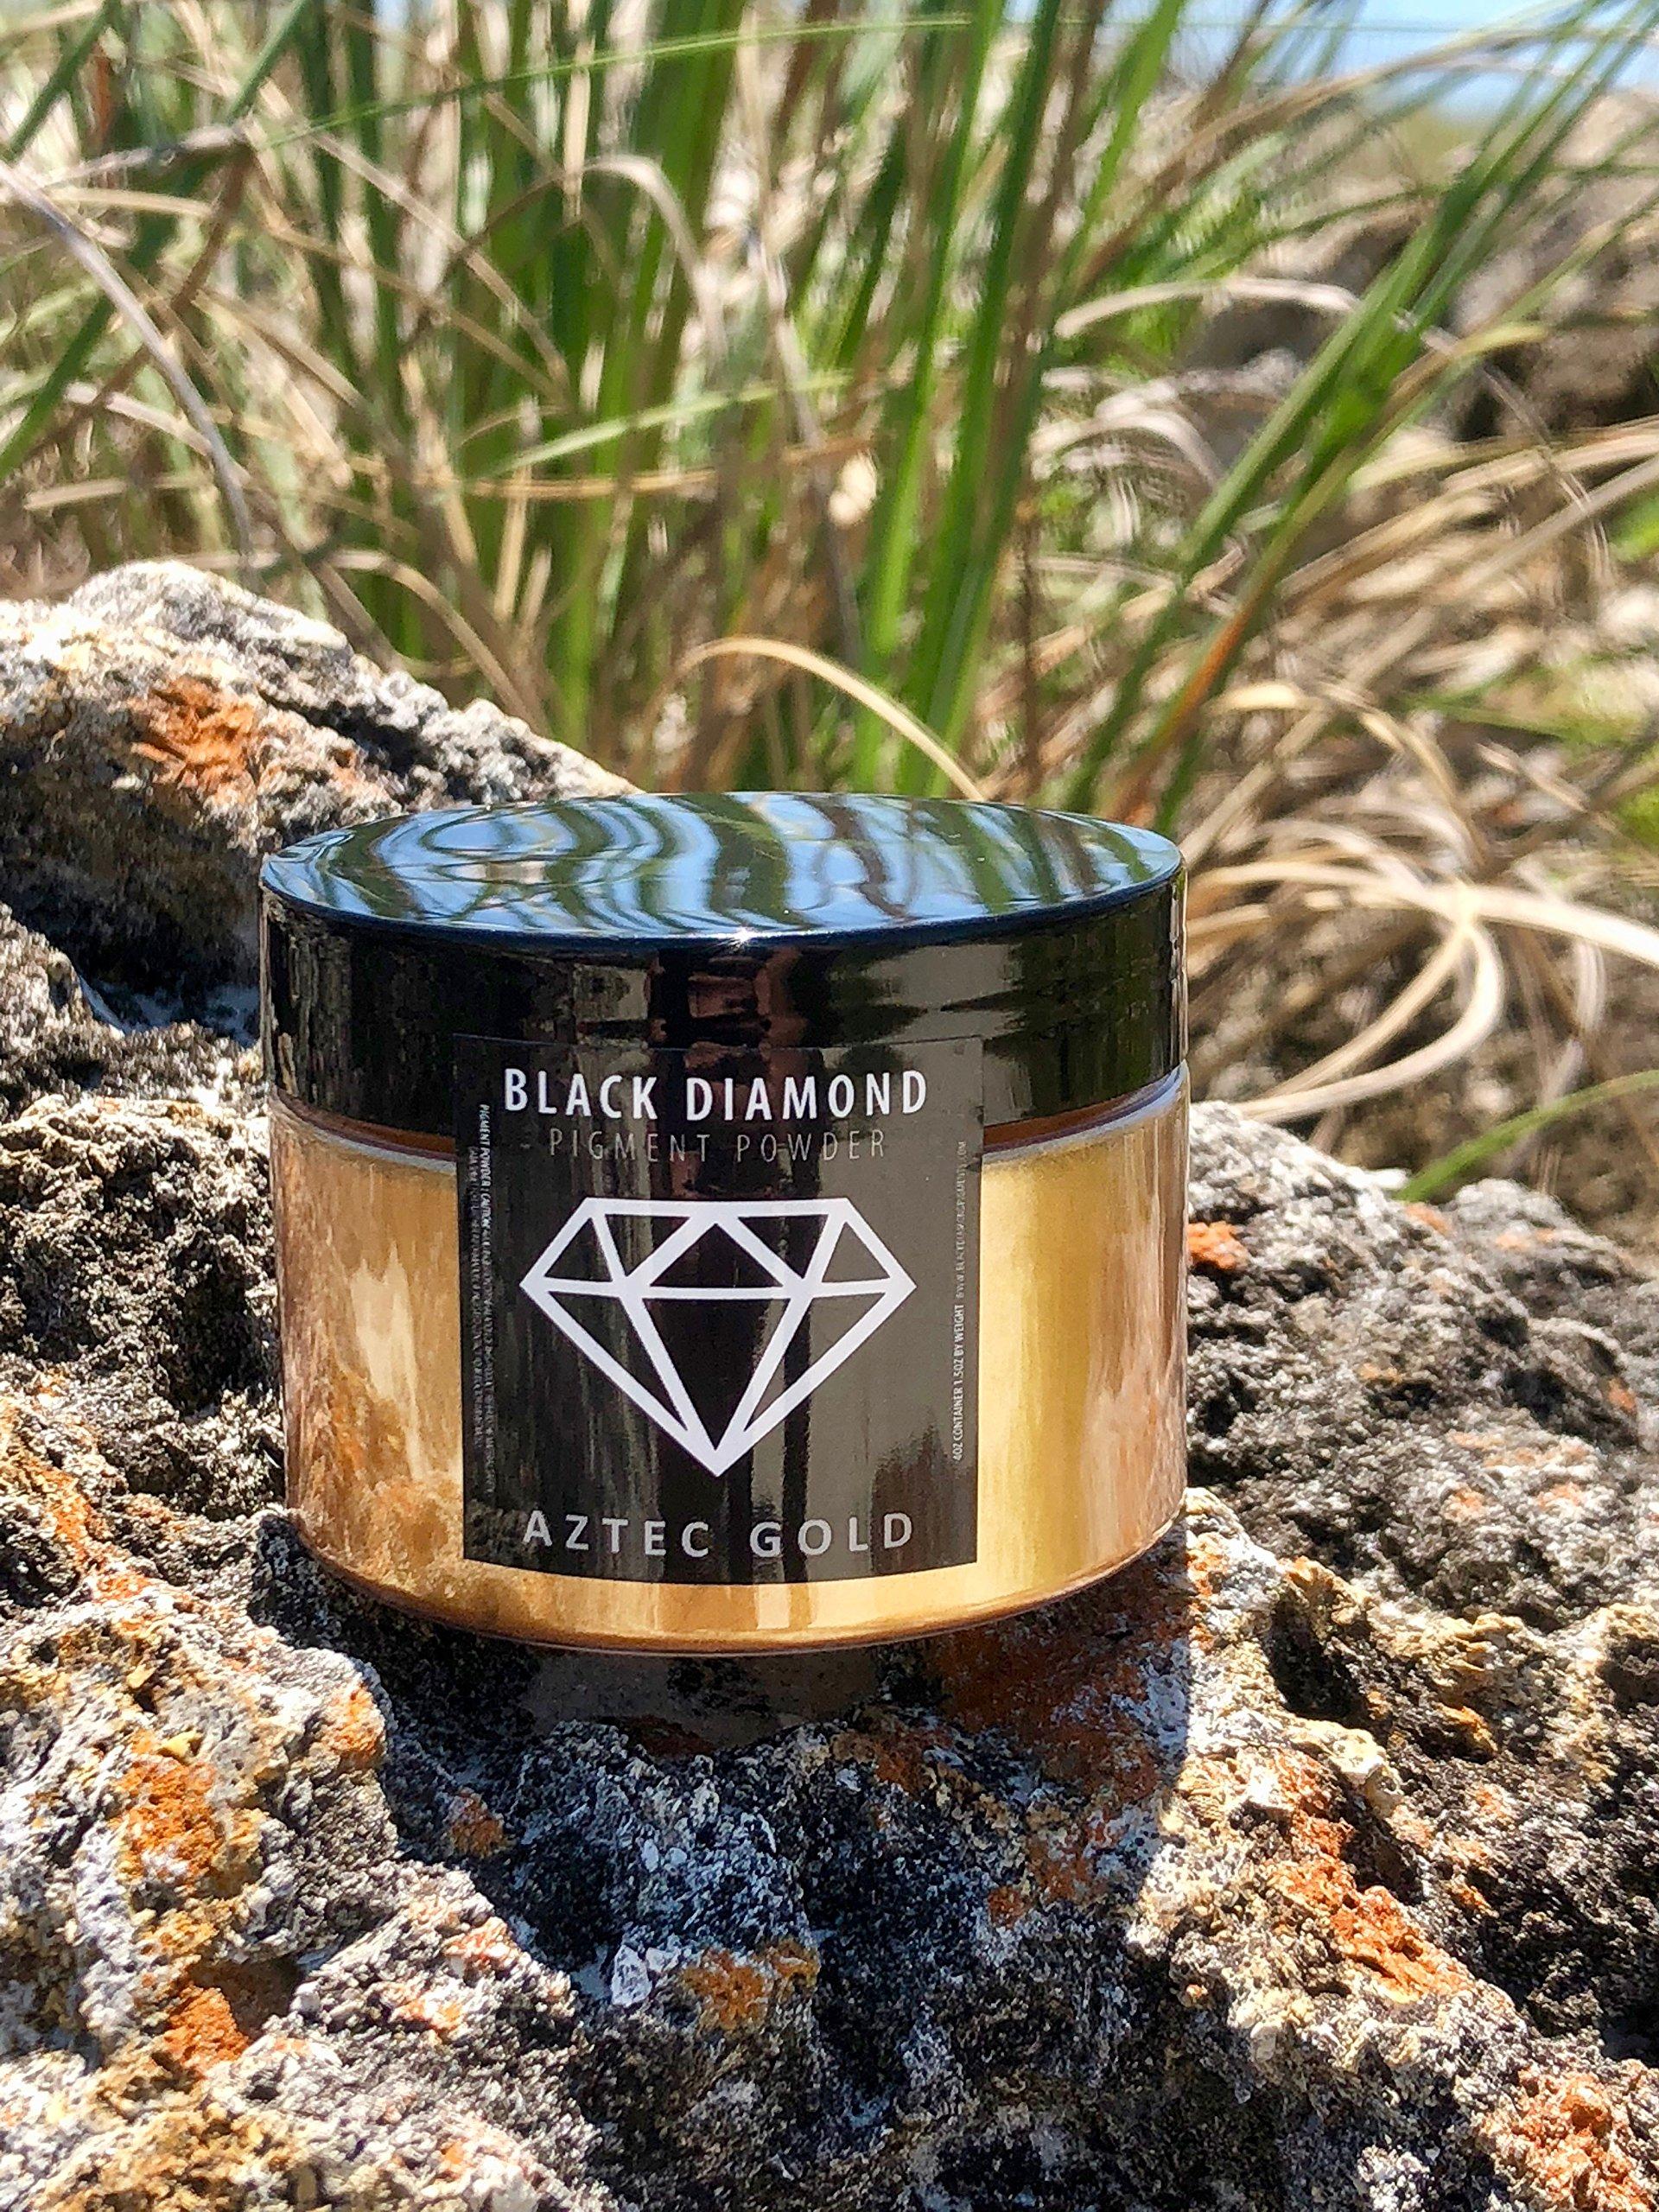 42g/1.5oz''Aztec Gold'' Mica Powder Pigment (Epoxy,Resin,Soap,Plastidip) Black Diamond PIGMENTS